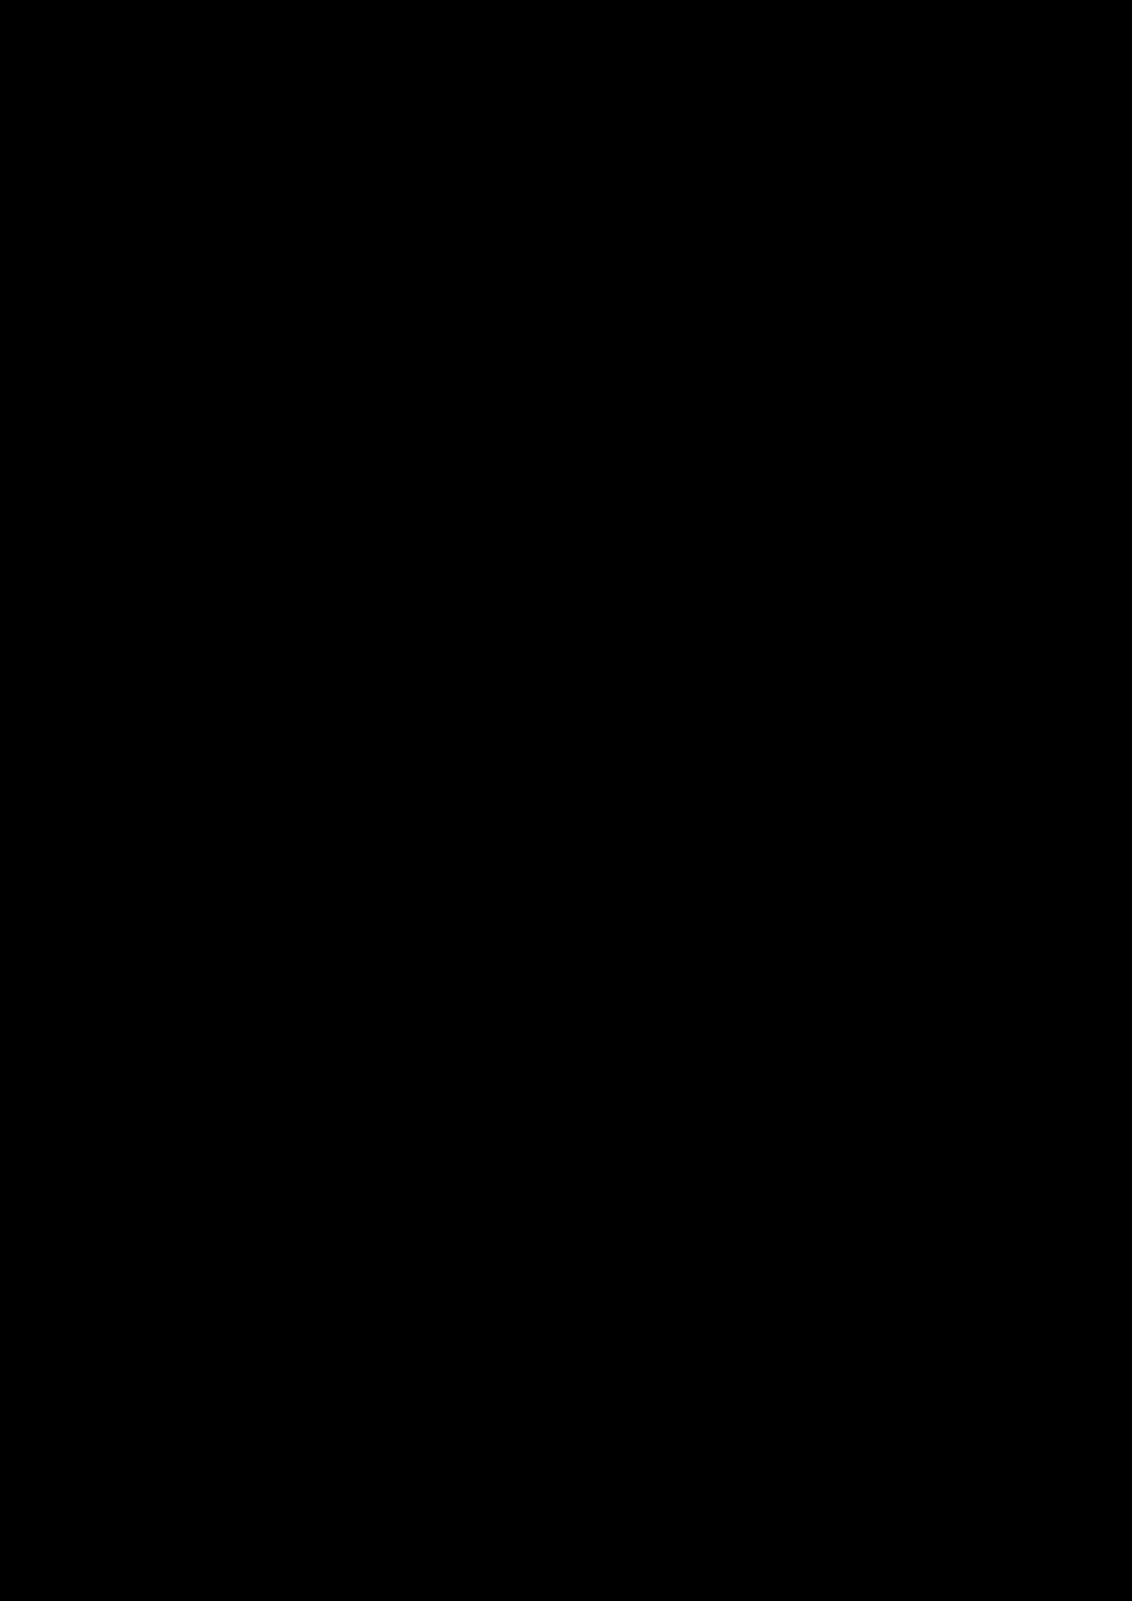 Ispoved Pervogo Boga slide, Image 65